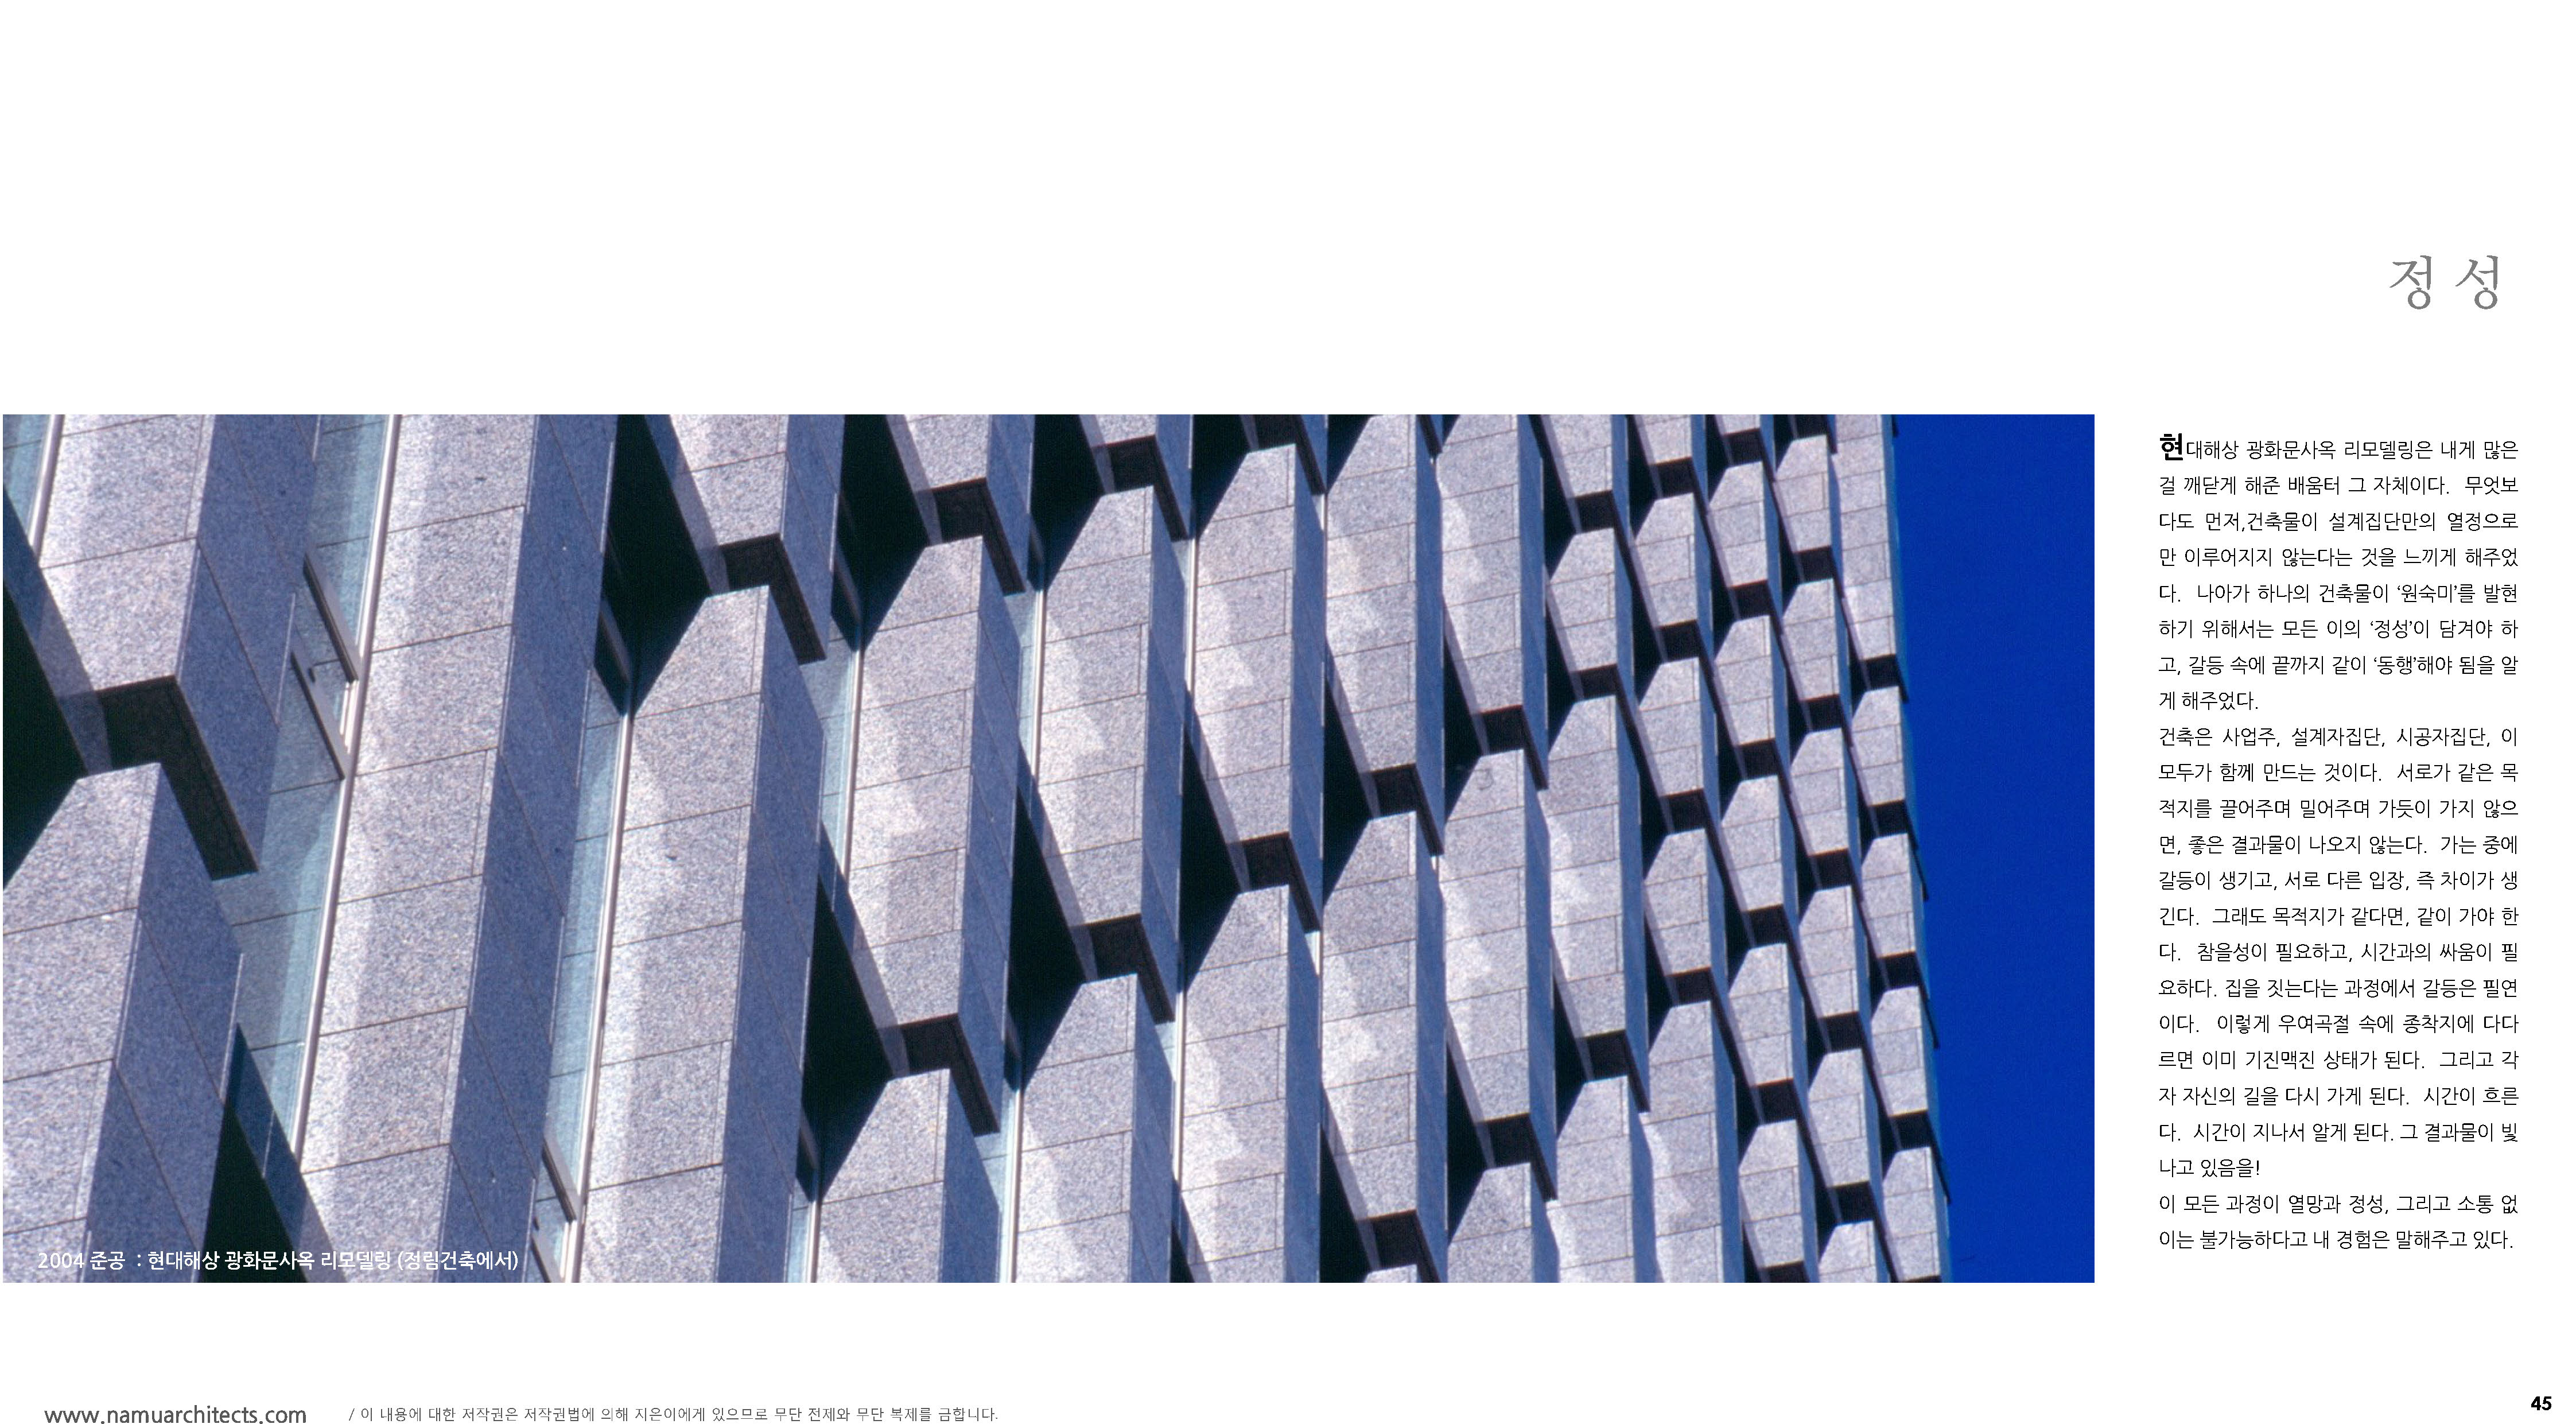 EAASY ON ARCH_페이지_45.jpg